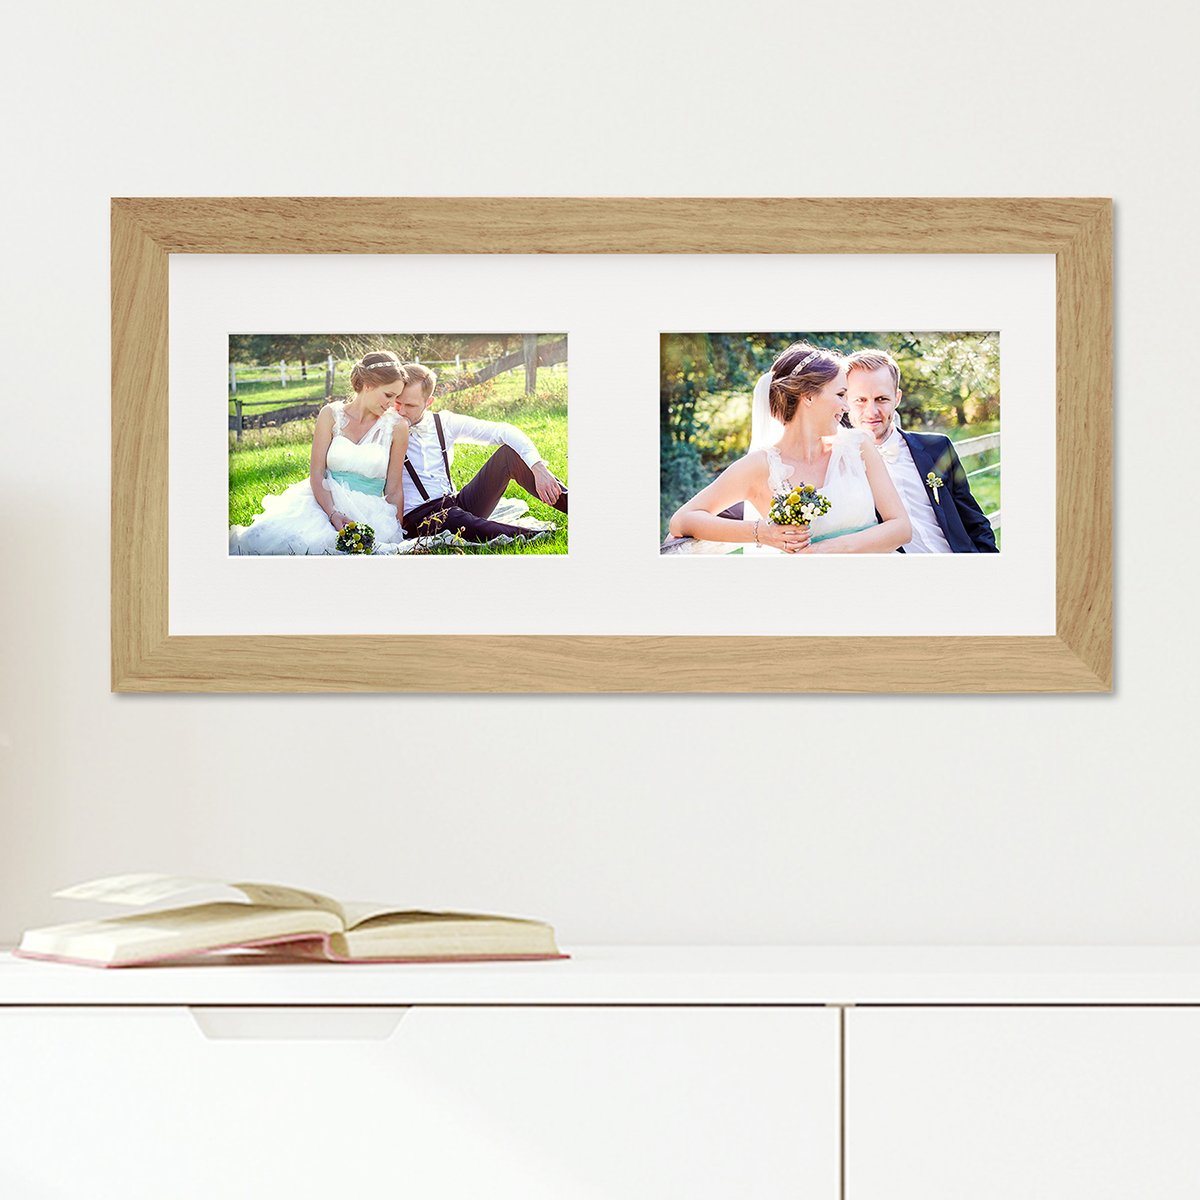 PHOTOLINI Fotocollage-Bilderrahmen Modern Eiche aus Massivholz ...